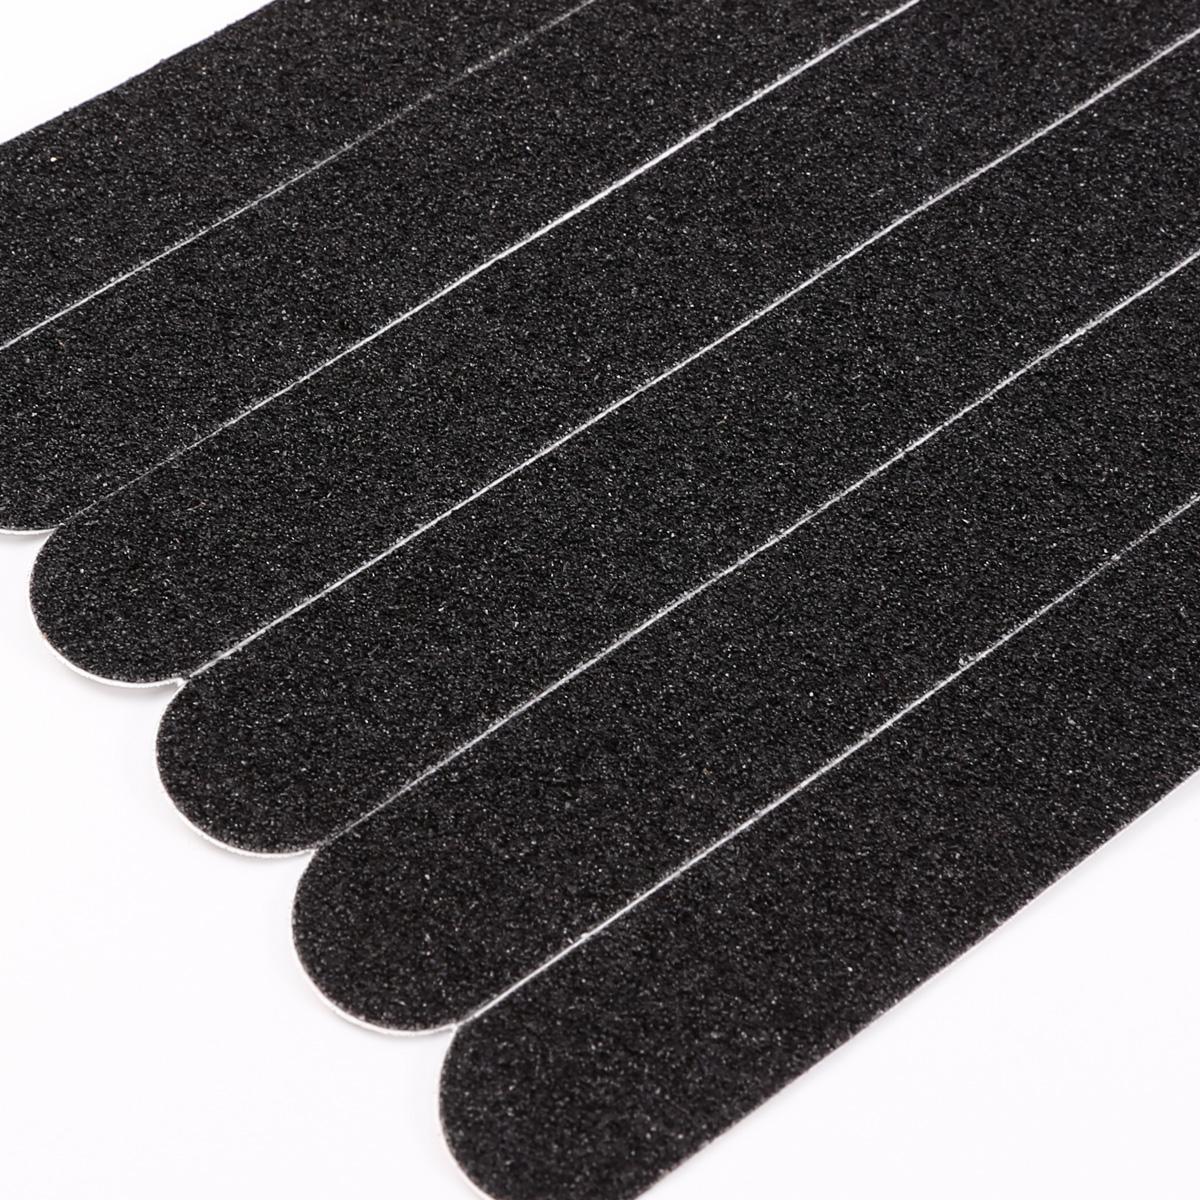 Anti Slip Floor Strips : Floor decking anti non slip tape grip safety adhesive